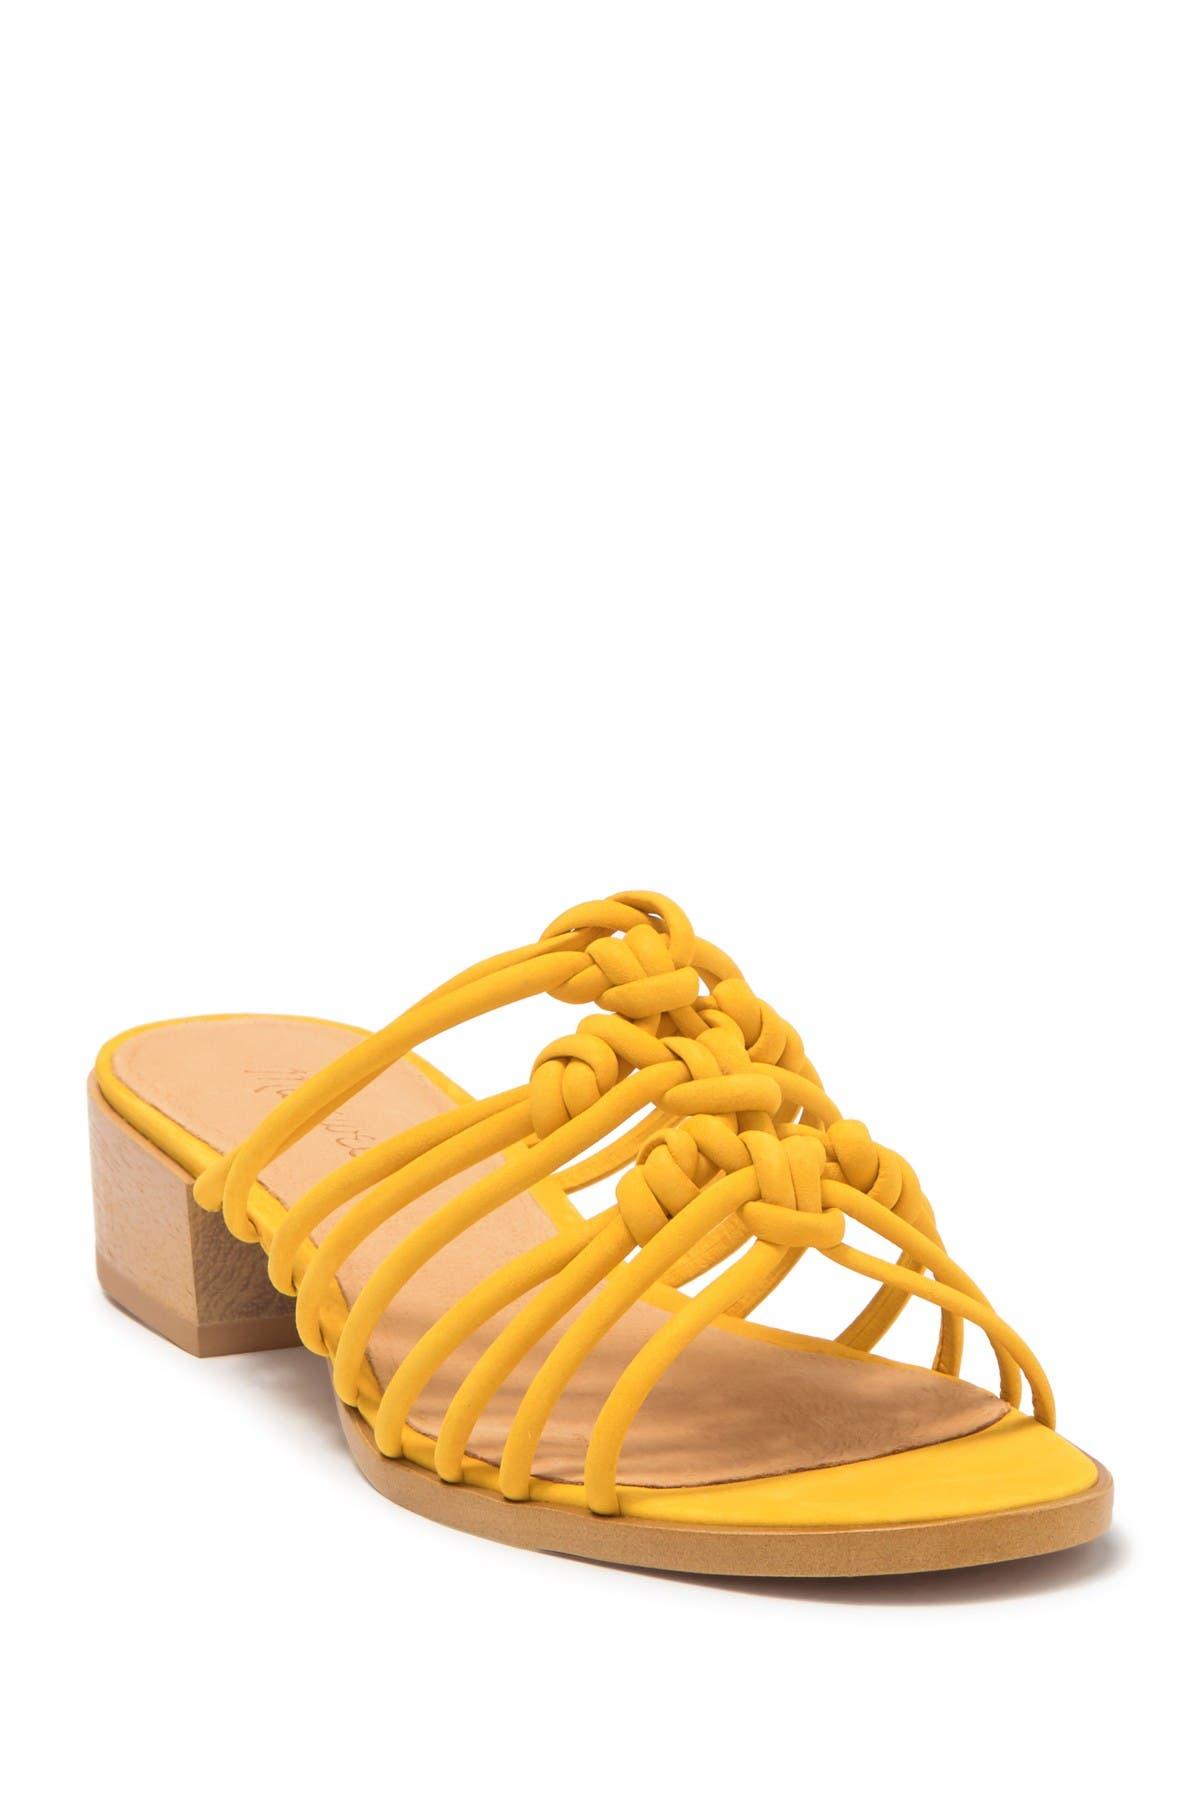 Image of Madewell Dakota Block Heel Sandal